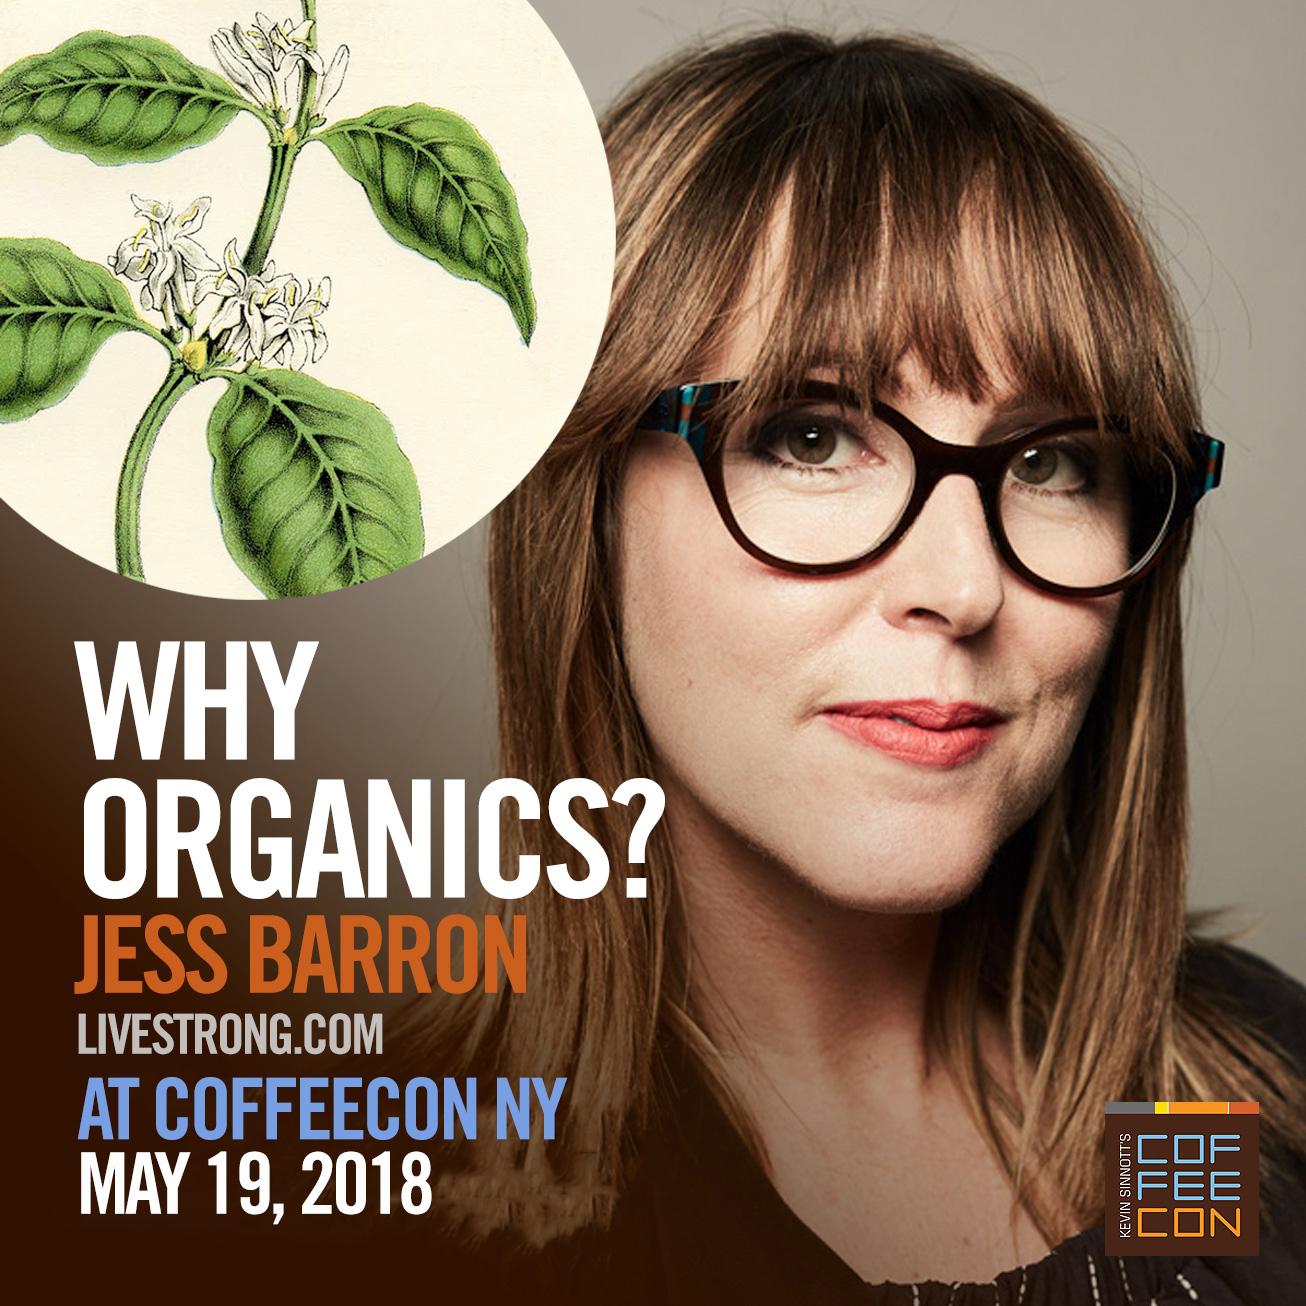 Why Oganics with Jess Barron